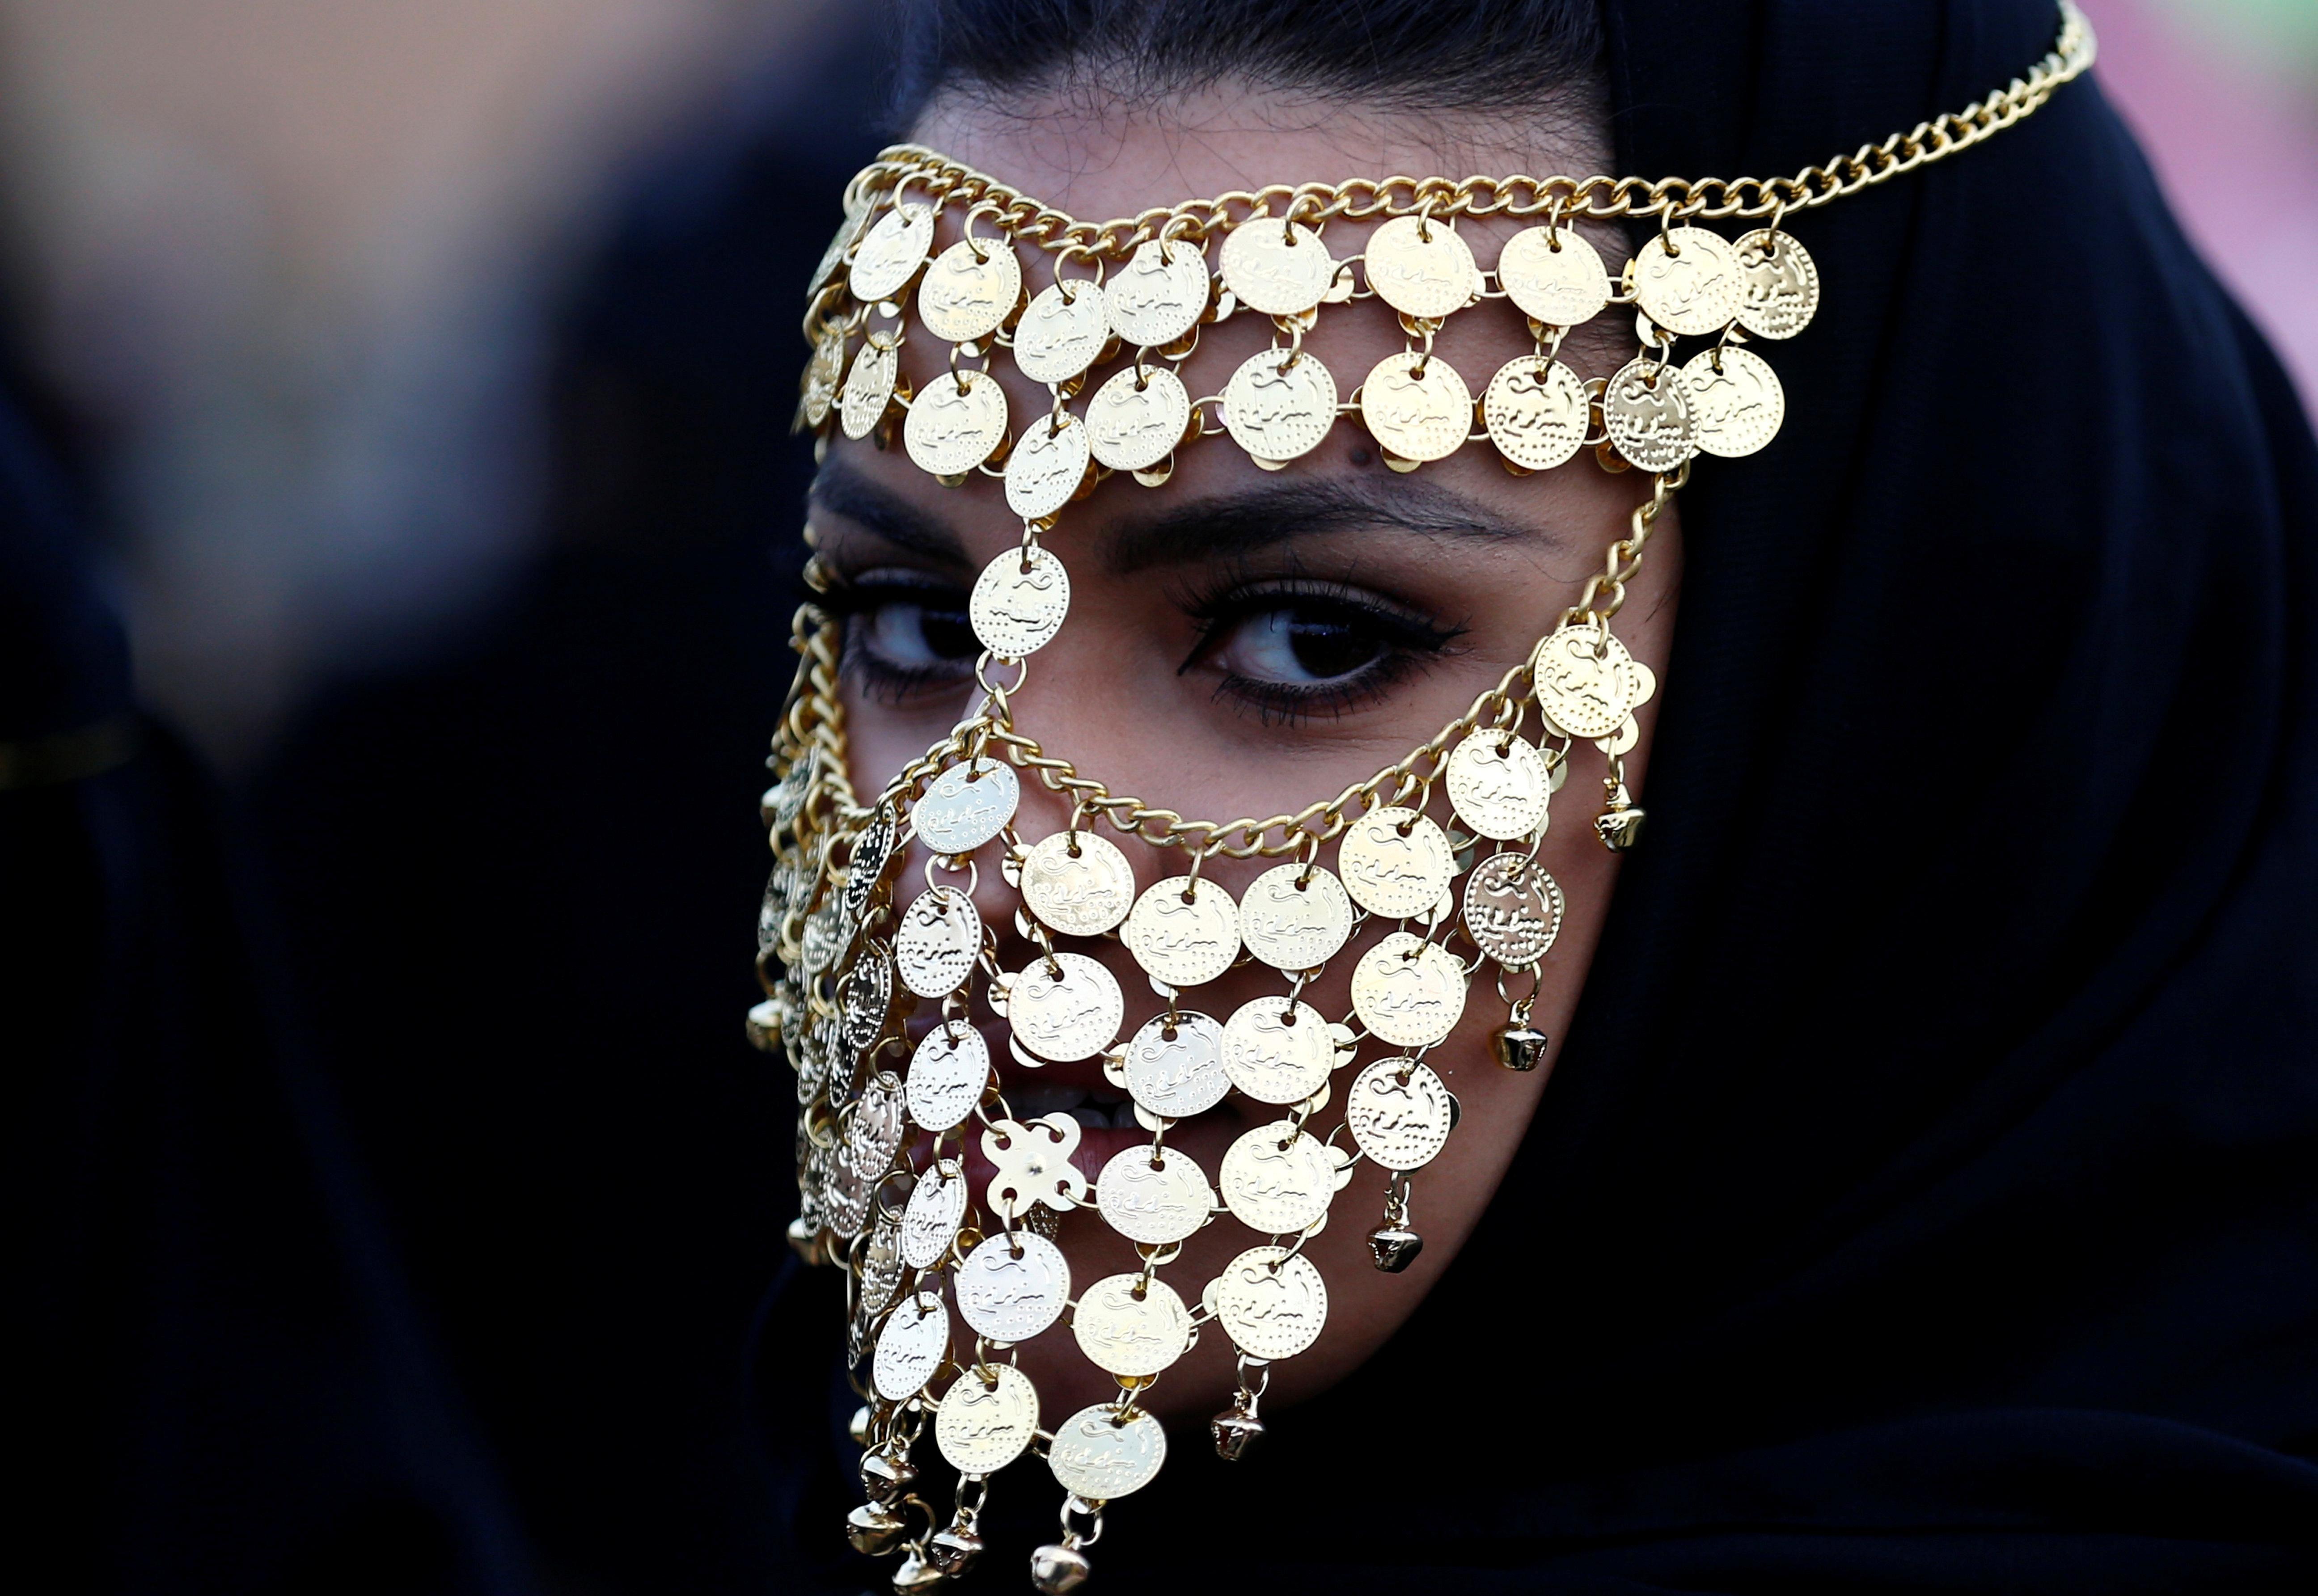 A Woman At The Janadriyah Cultural Festival In Saudi Arabia 5184x3570 Arabian Women Face Jewellery Arab Women